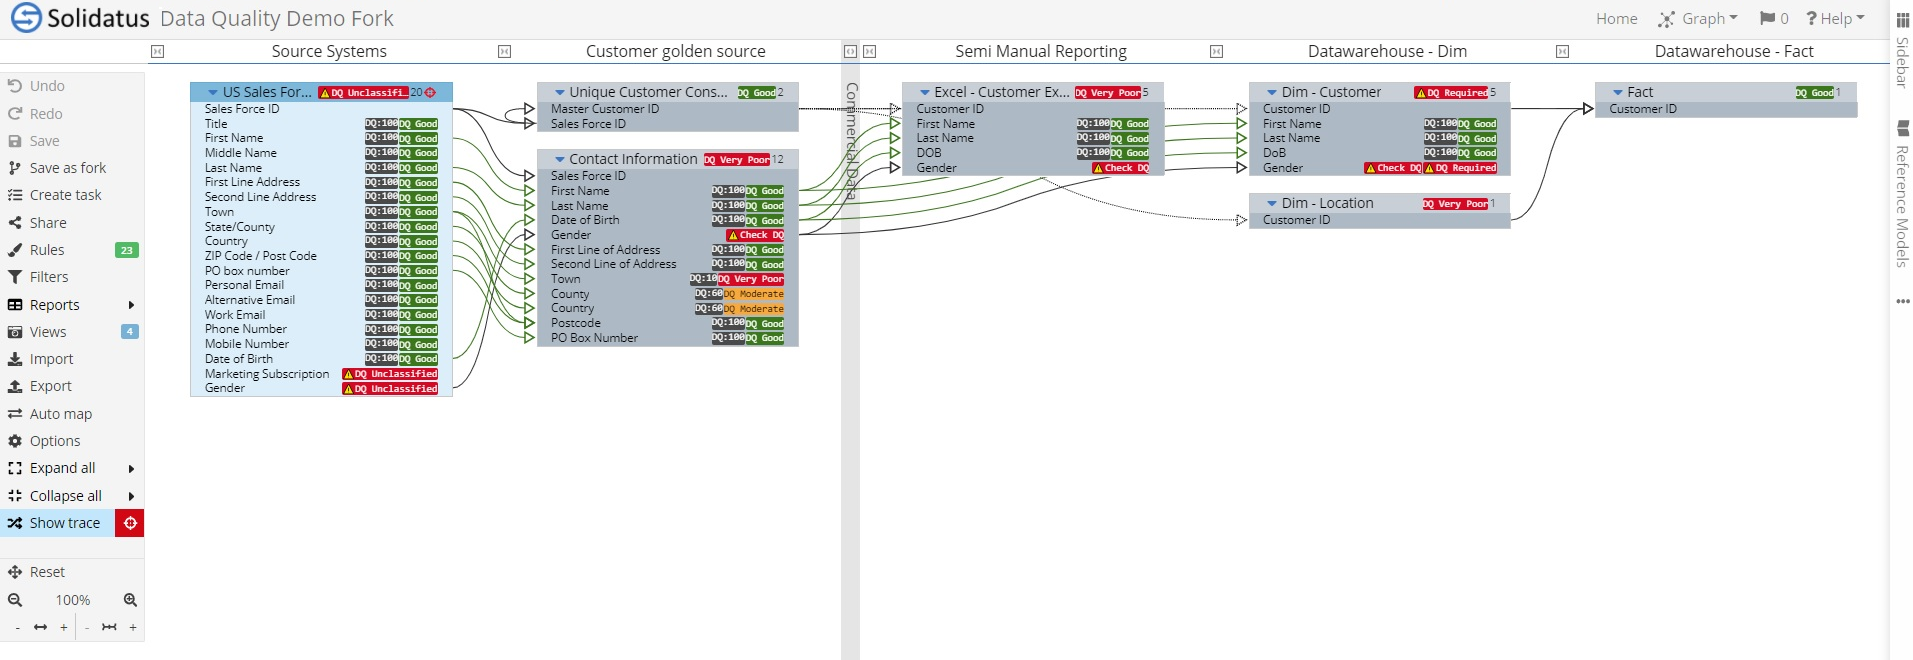 Data Quality Model